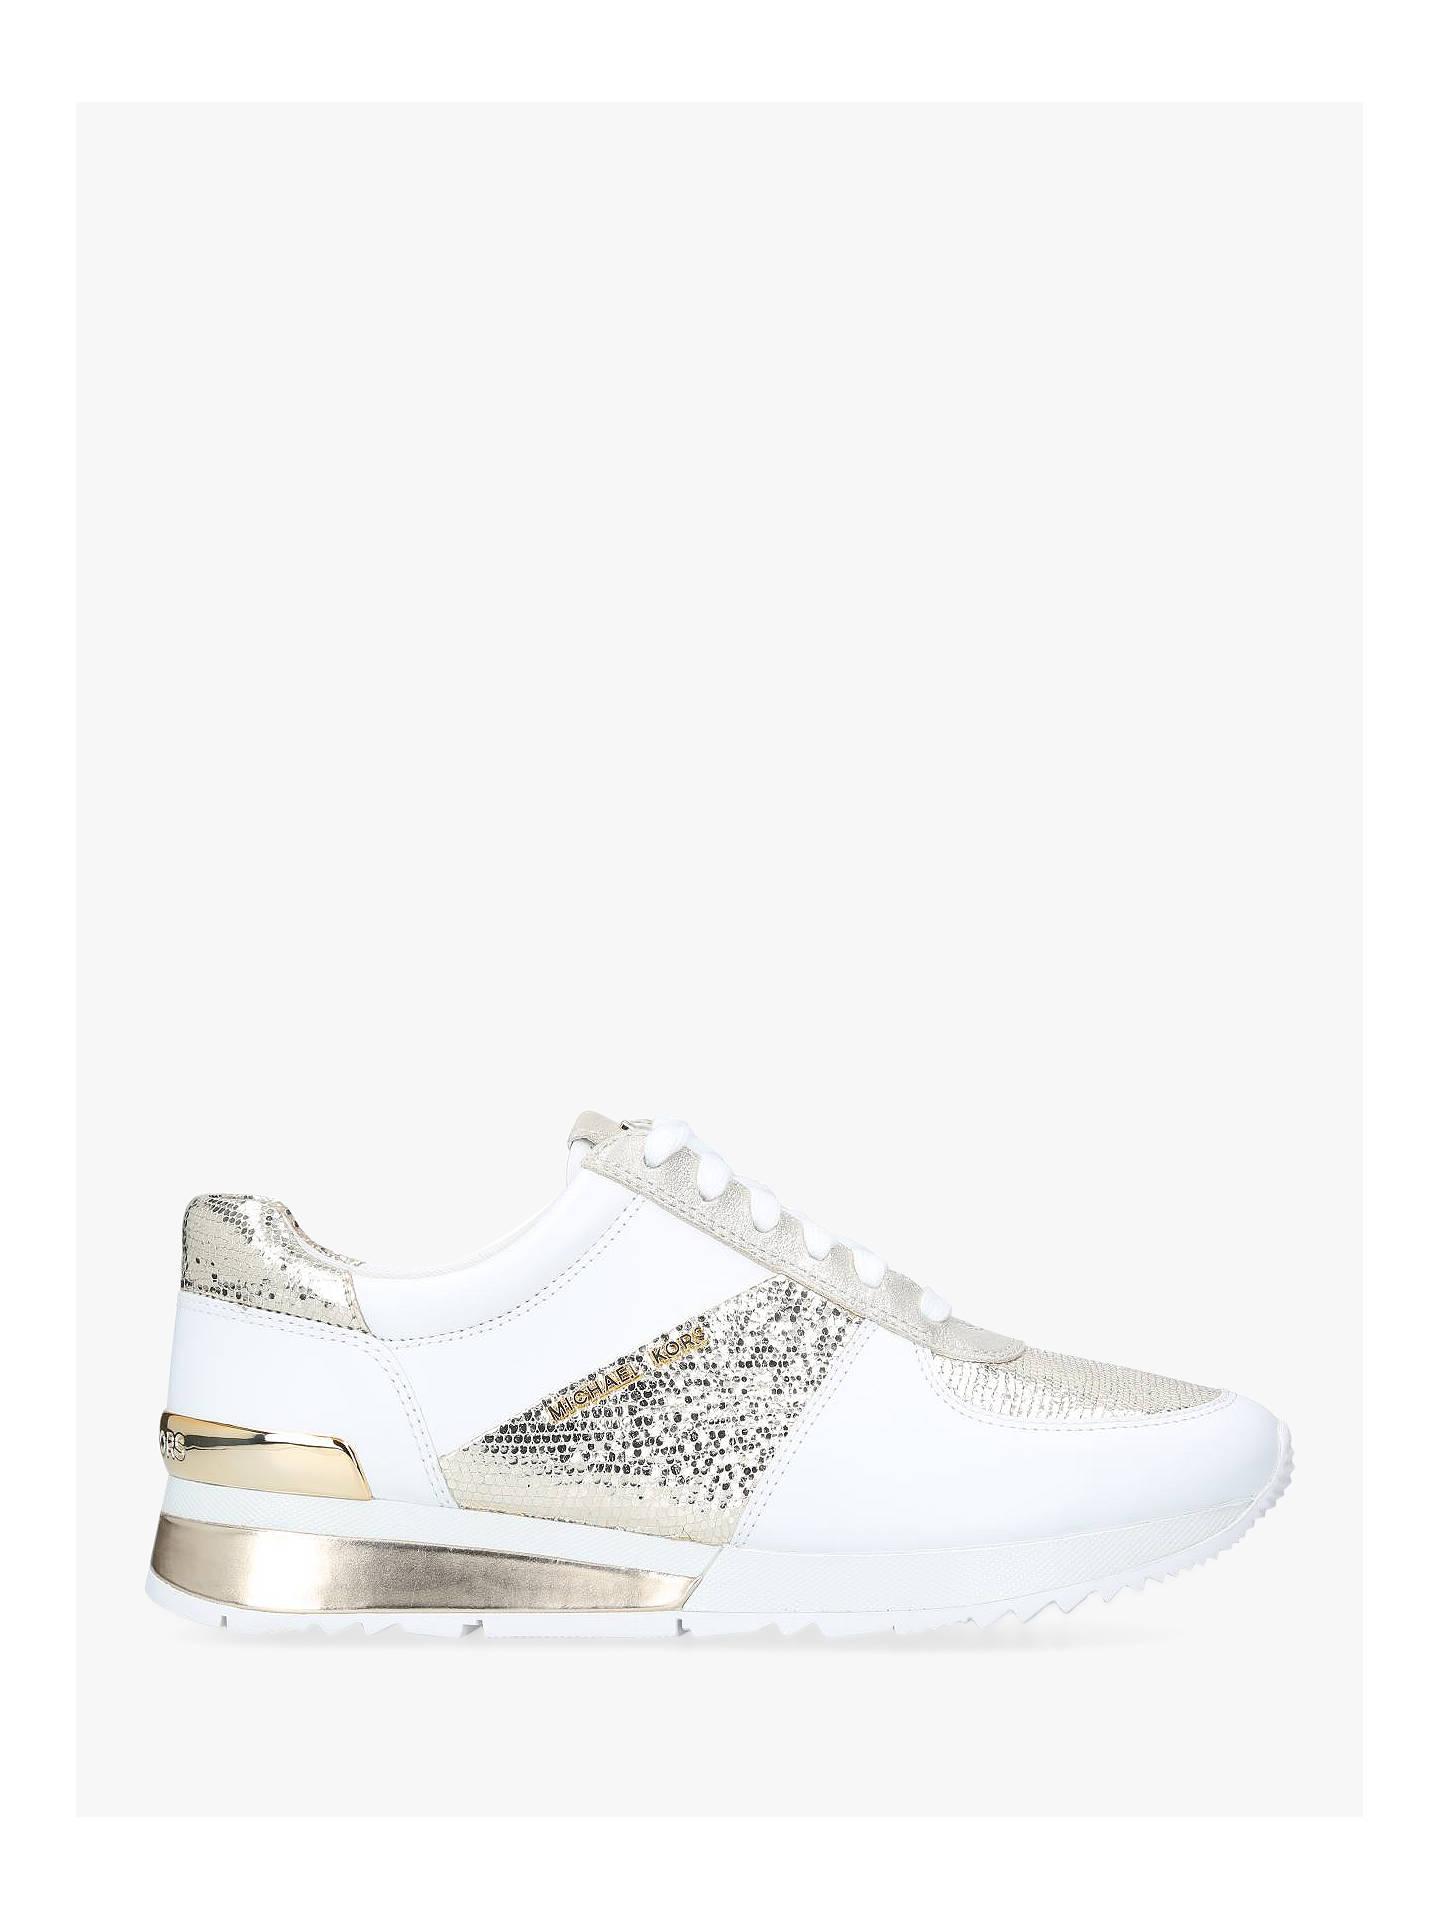 70032eafa3dea Buy MICHAEL Michael Kors Allie Wrap Lace Up Trainers, White/Gold Leather, 5  ...